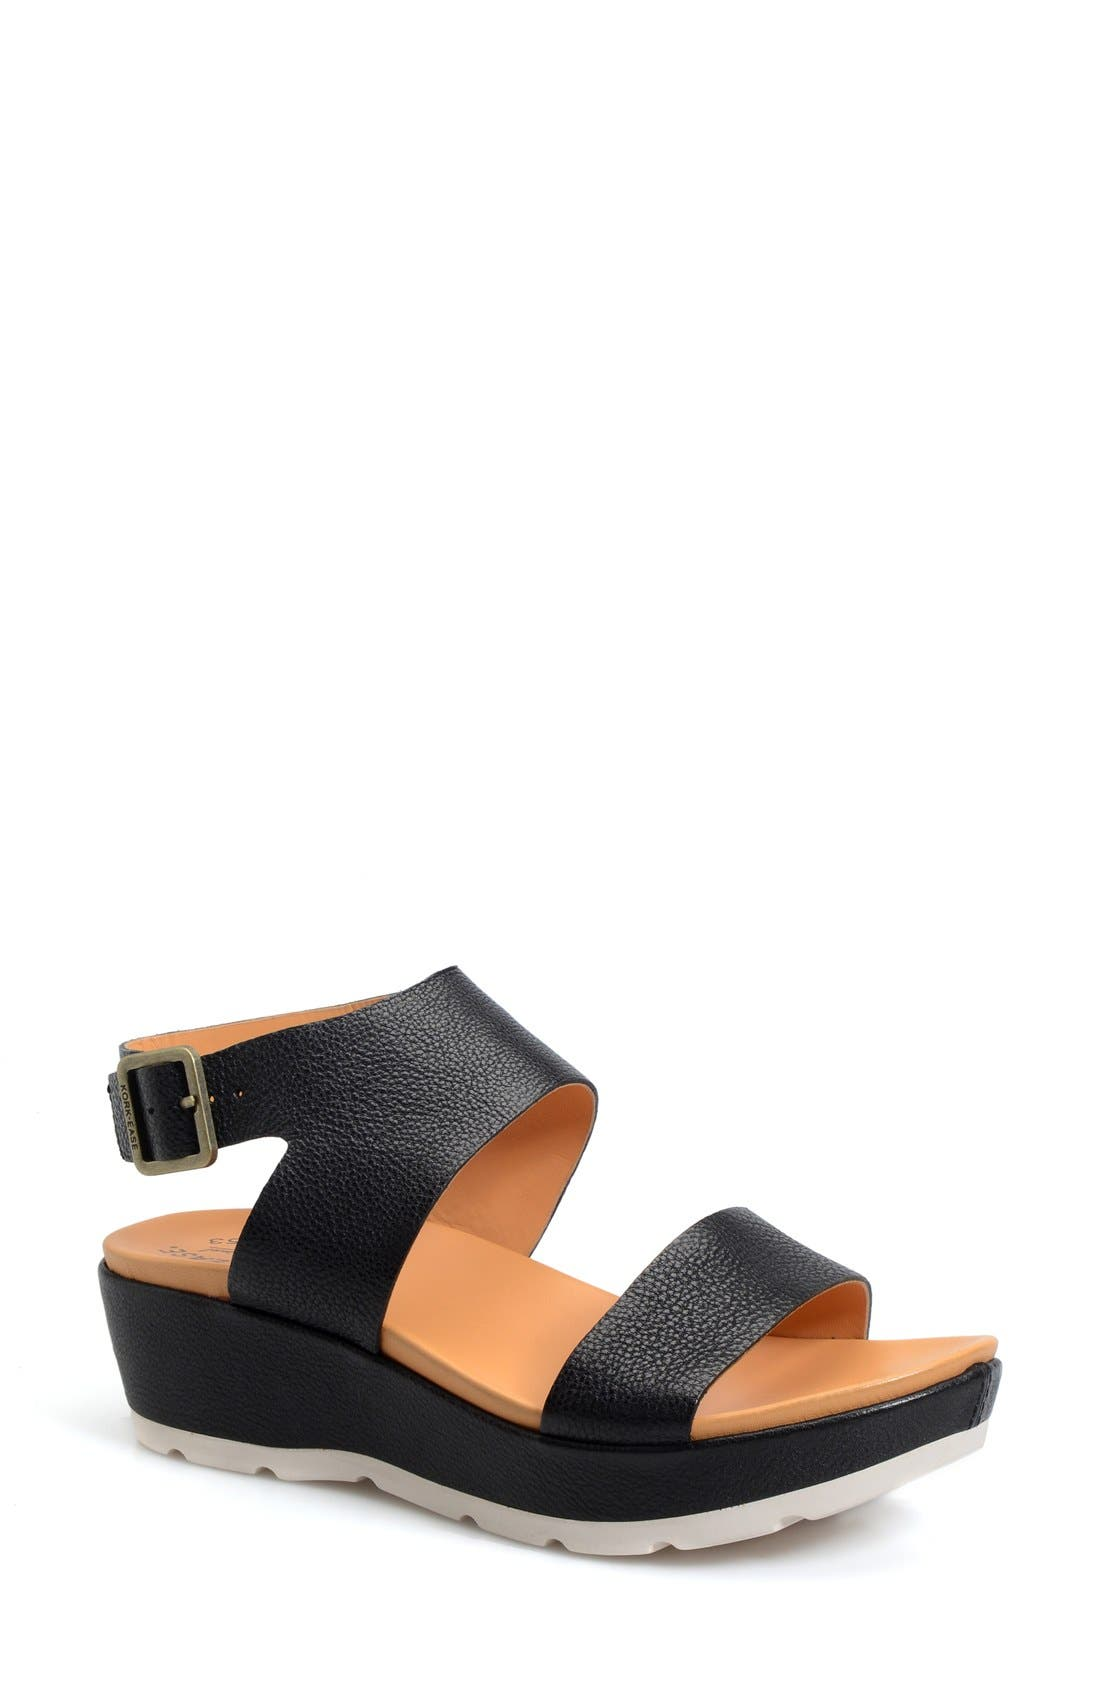 'Khloe' Platform Wedge Sandal,                             Main thumbnail 1, color,